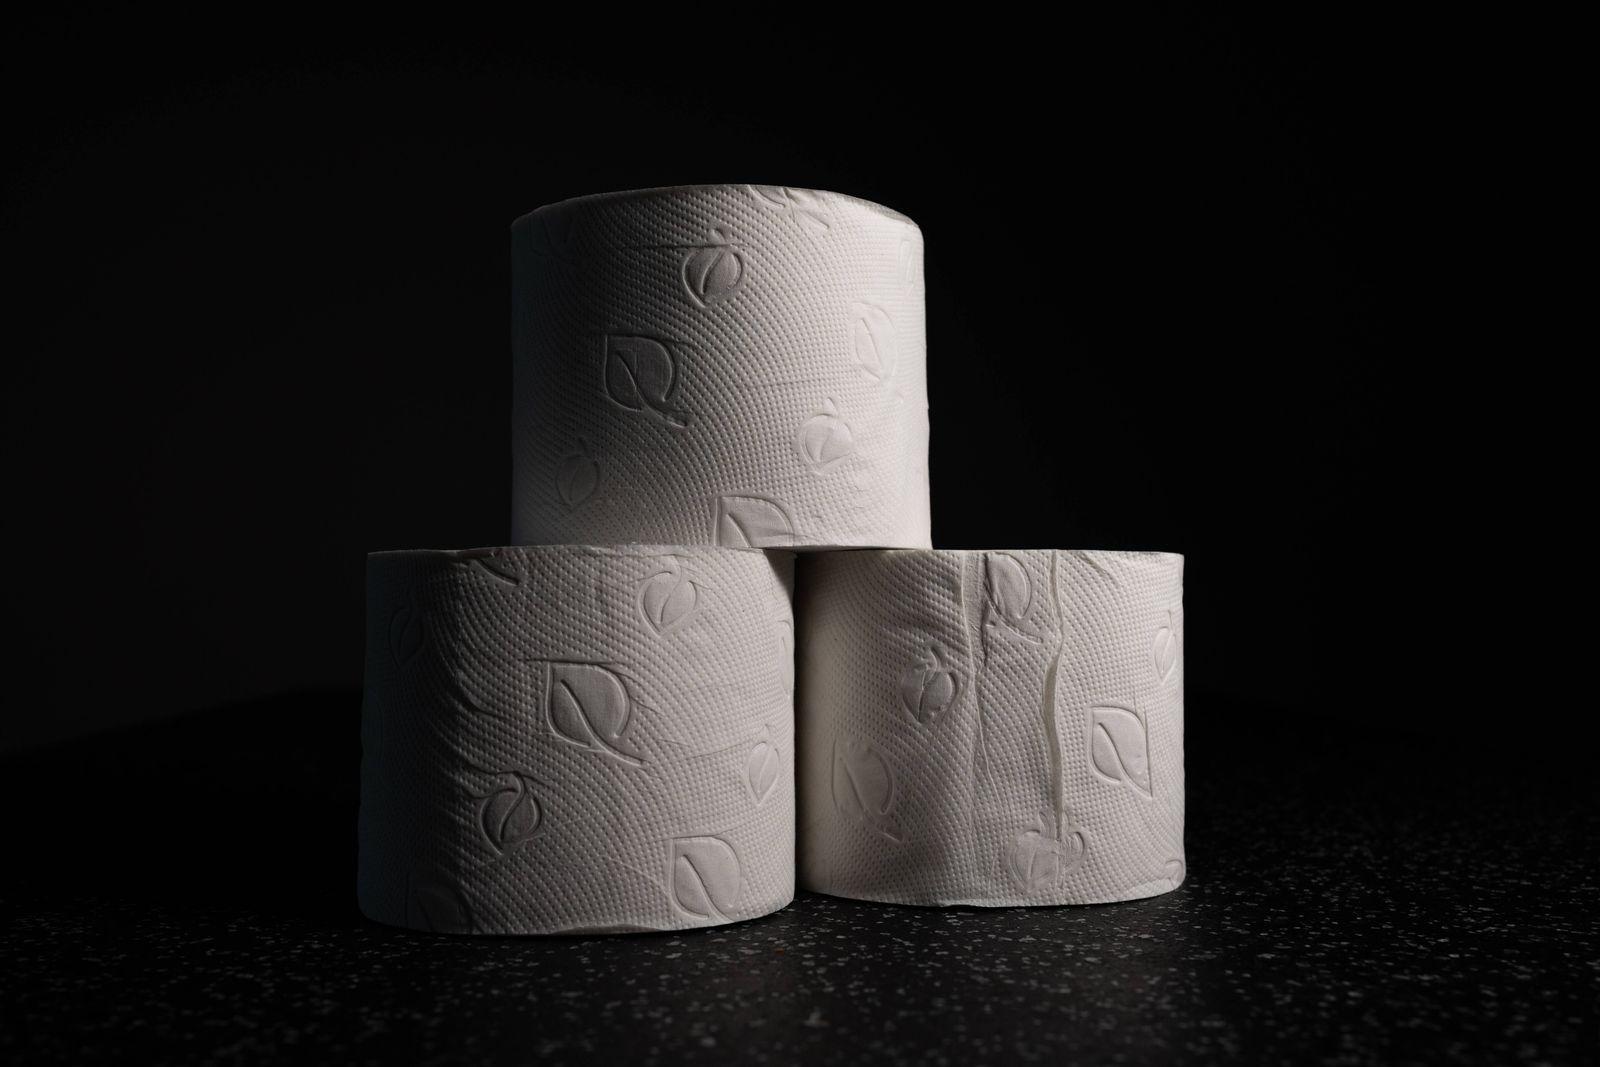 Klopapier, Toilettenpapier Symbolbild, 3 Rollen Toilettenpapier auf dunklem Hintergrund. *** Toilet paper, toilet paper